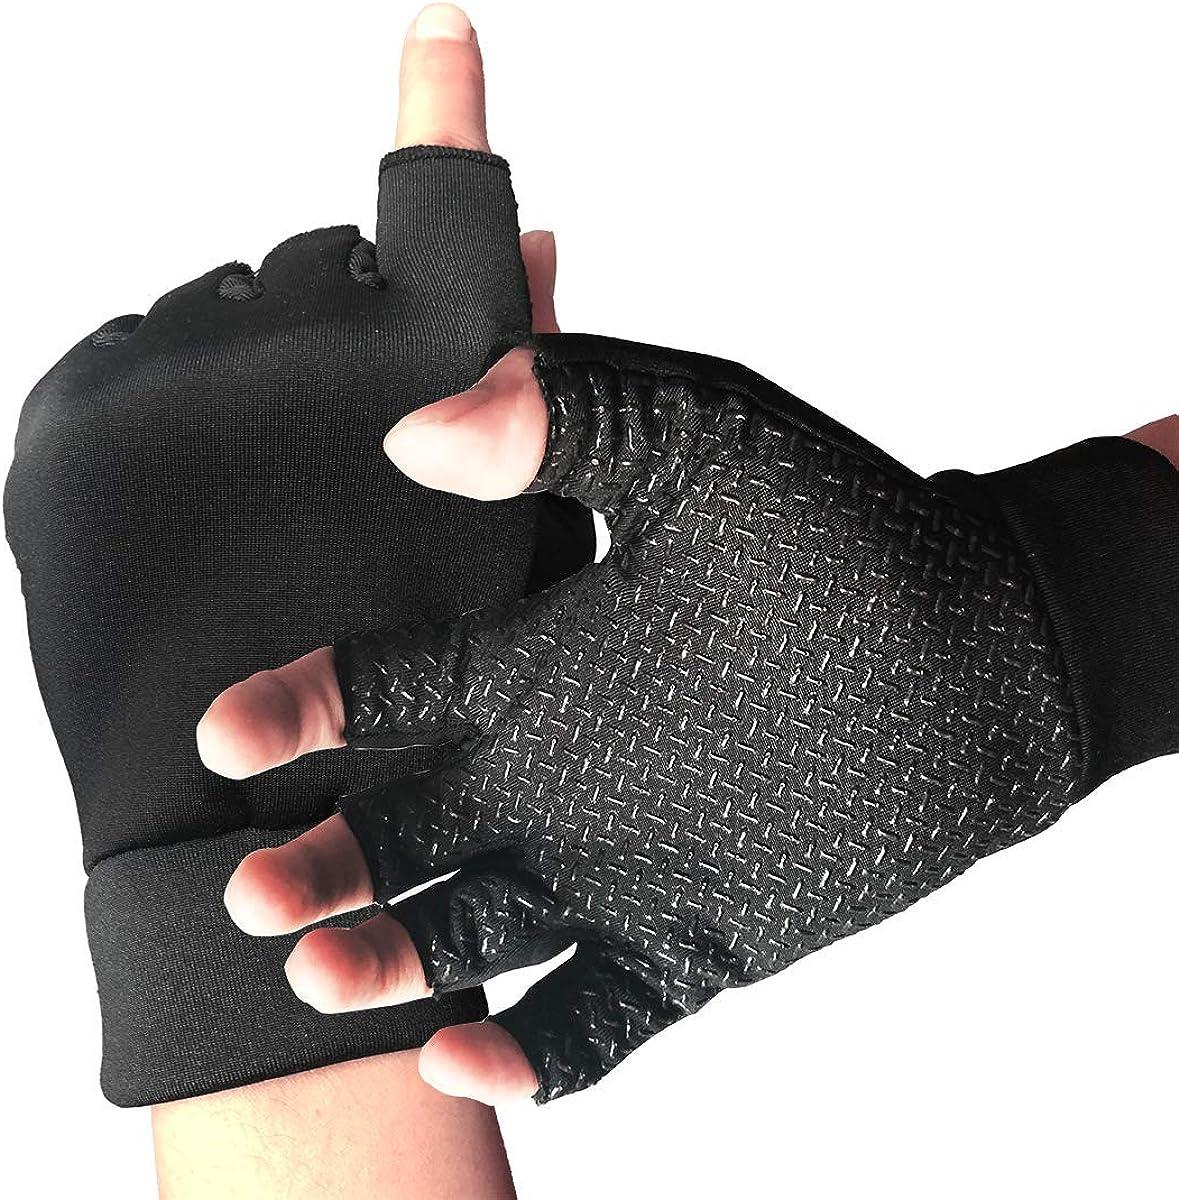 Gloves Fingerless Gloves Short Touchscreen Gloves Winter Motorcycle Biker Mitten